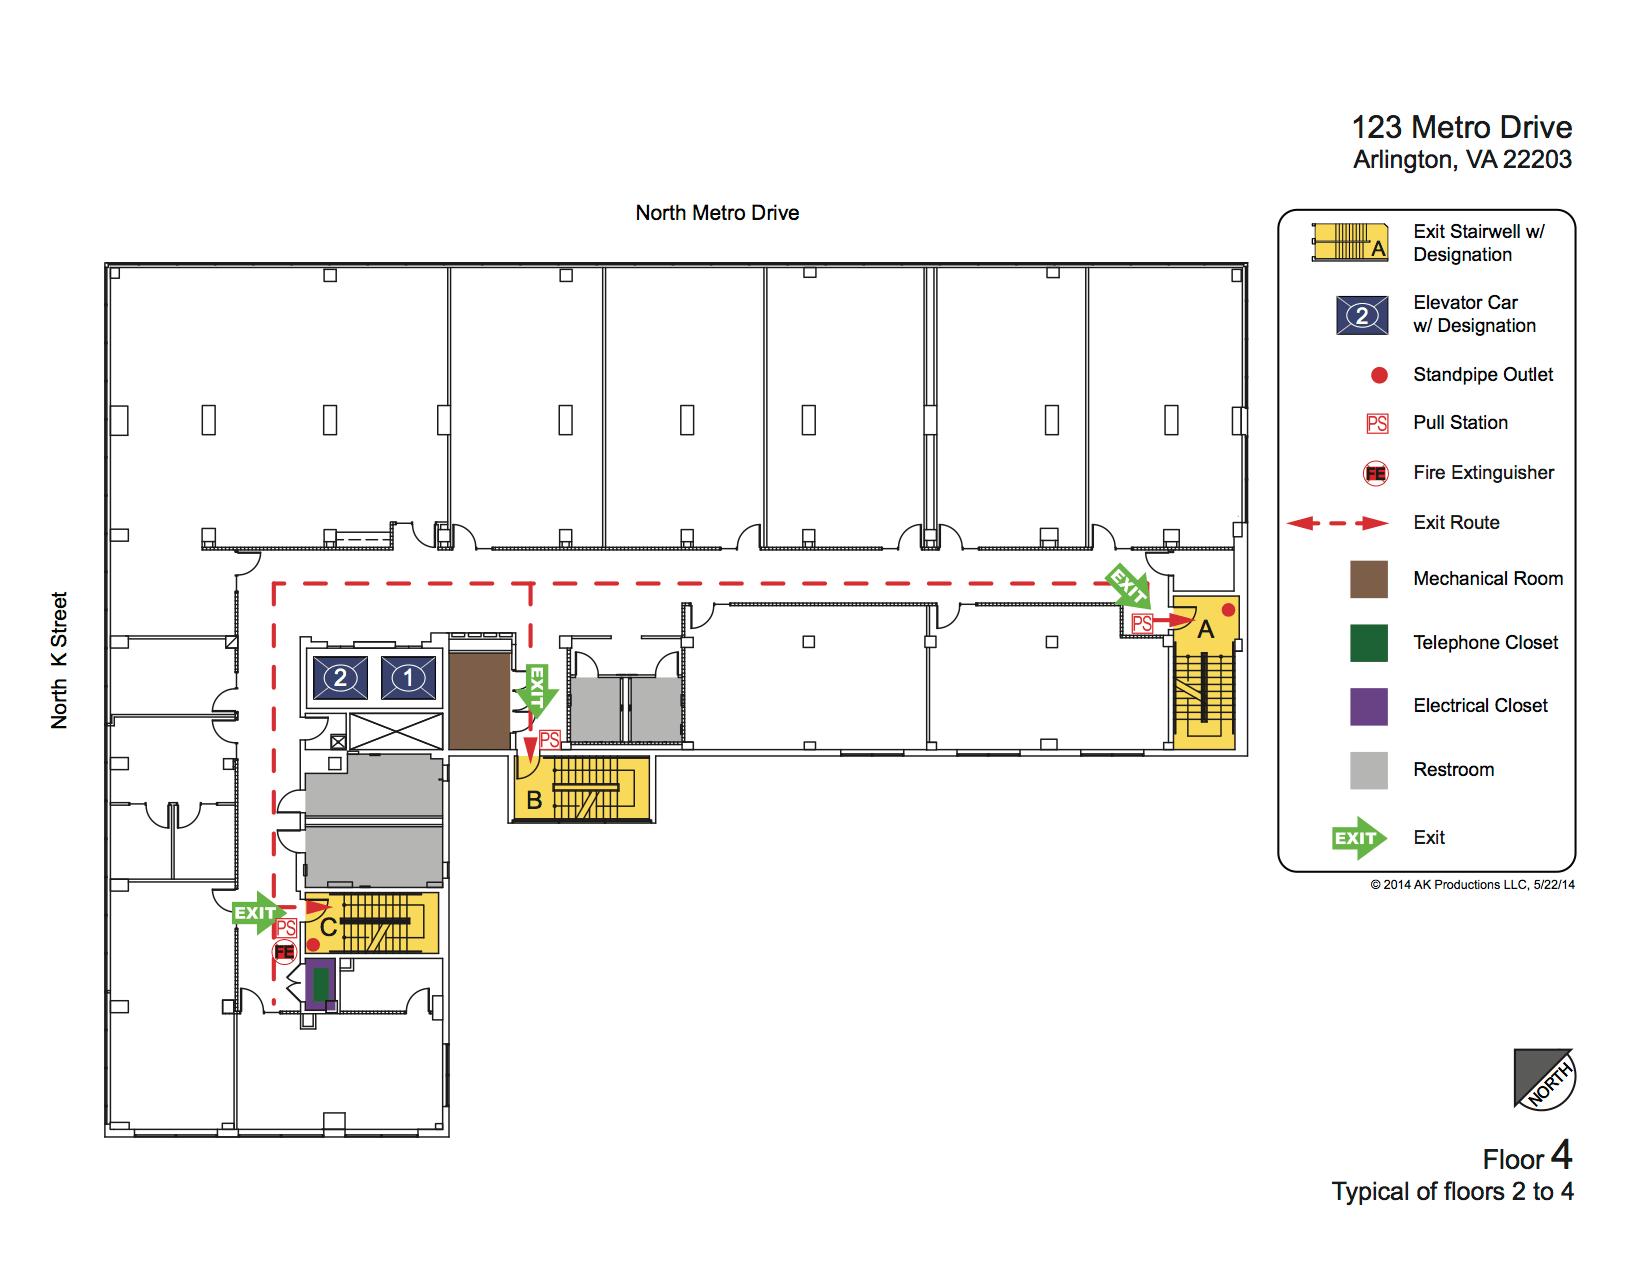 Emergency Plan Diagrams